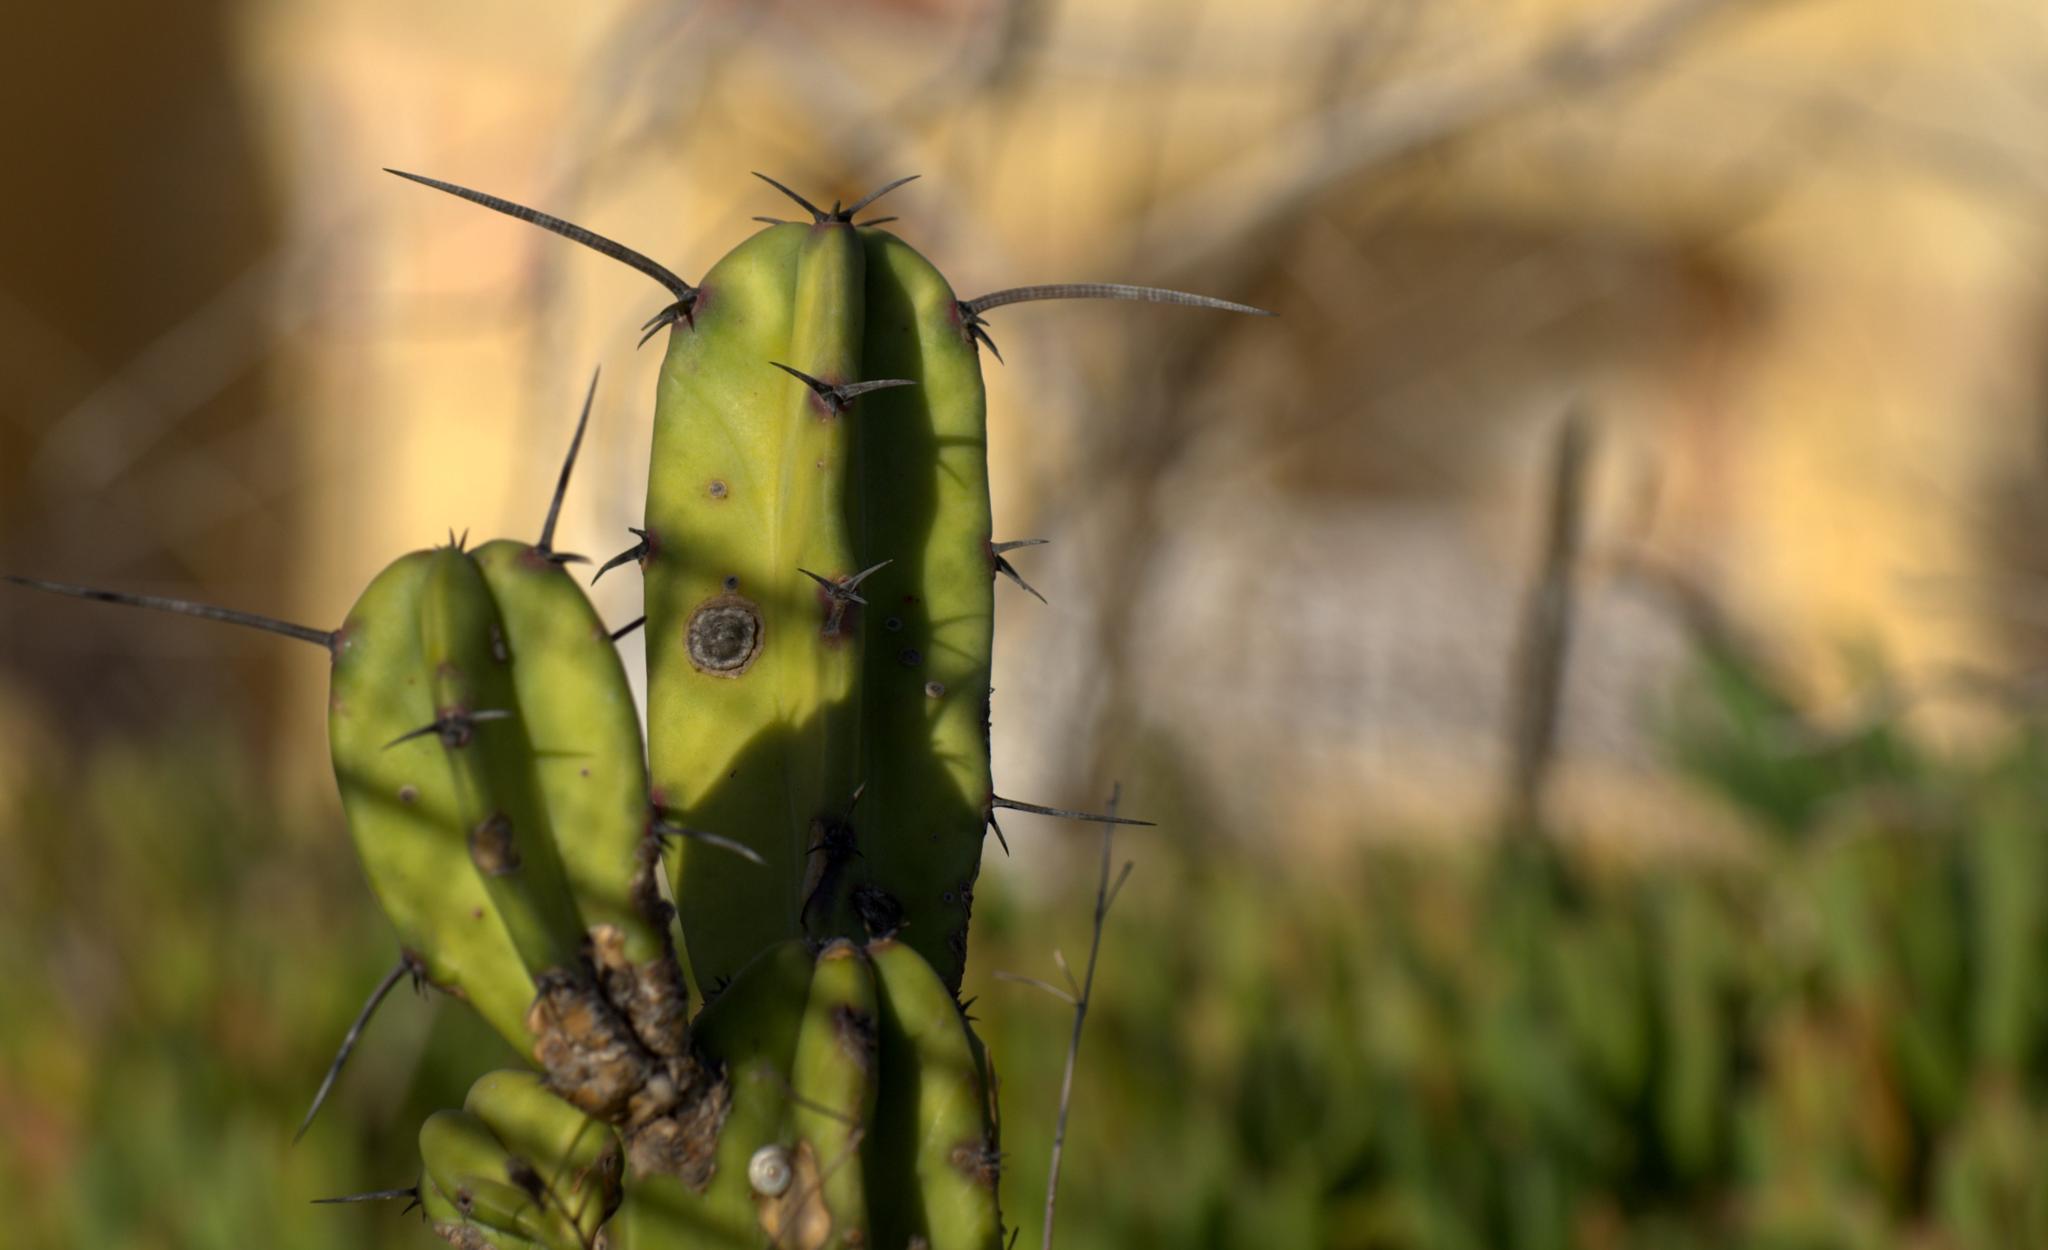 Cactus by Jozsef Keszan